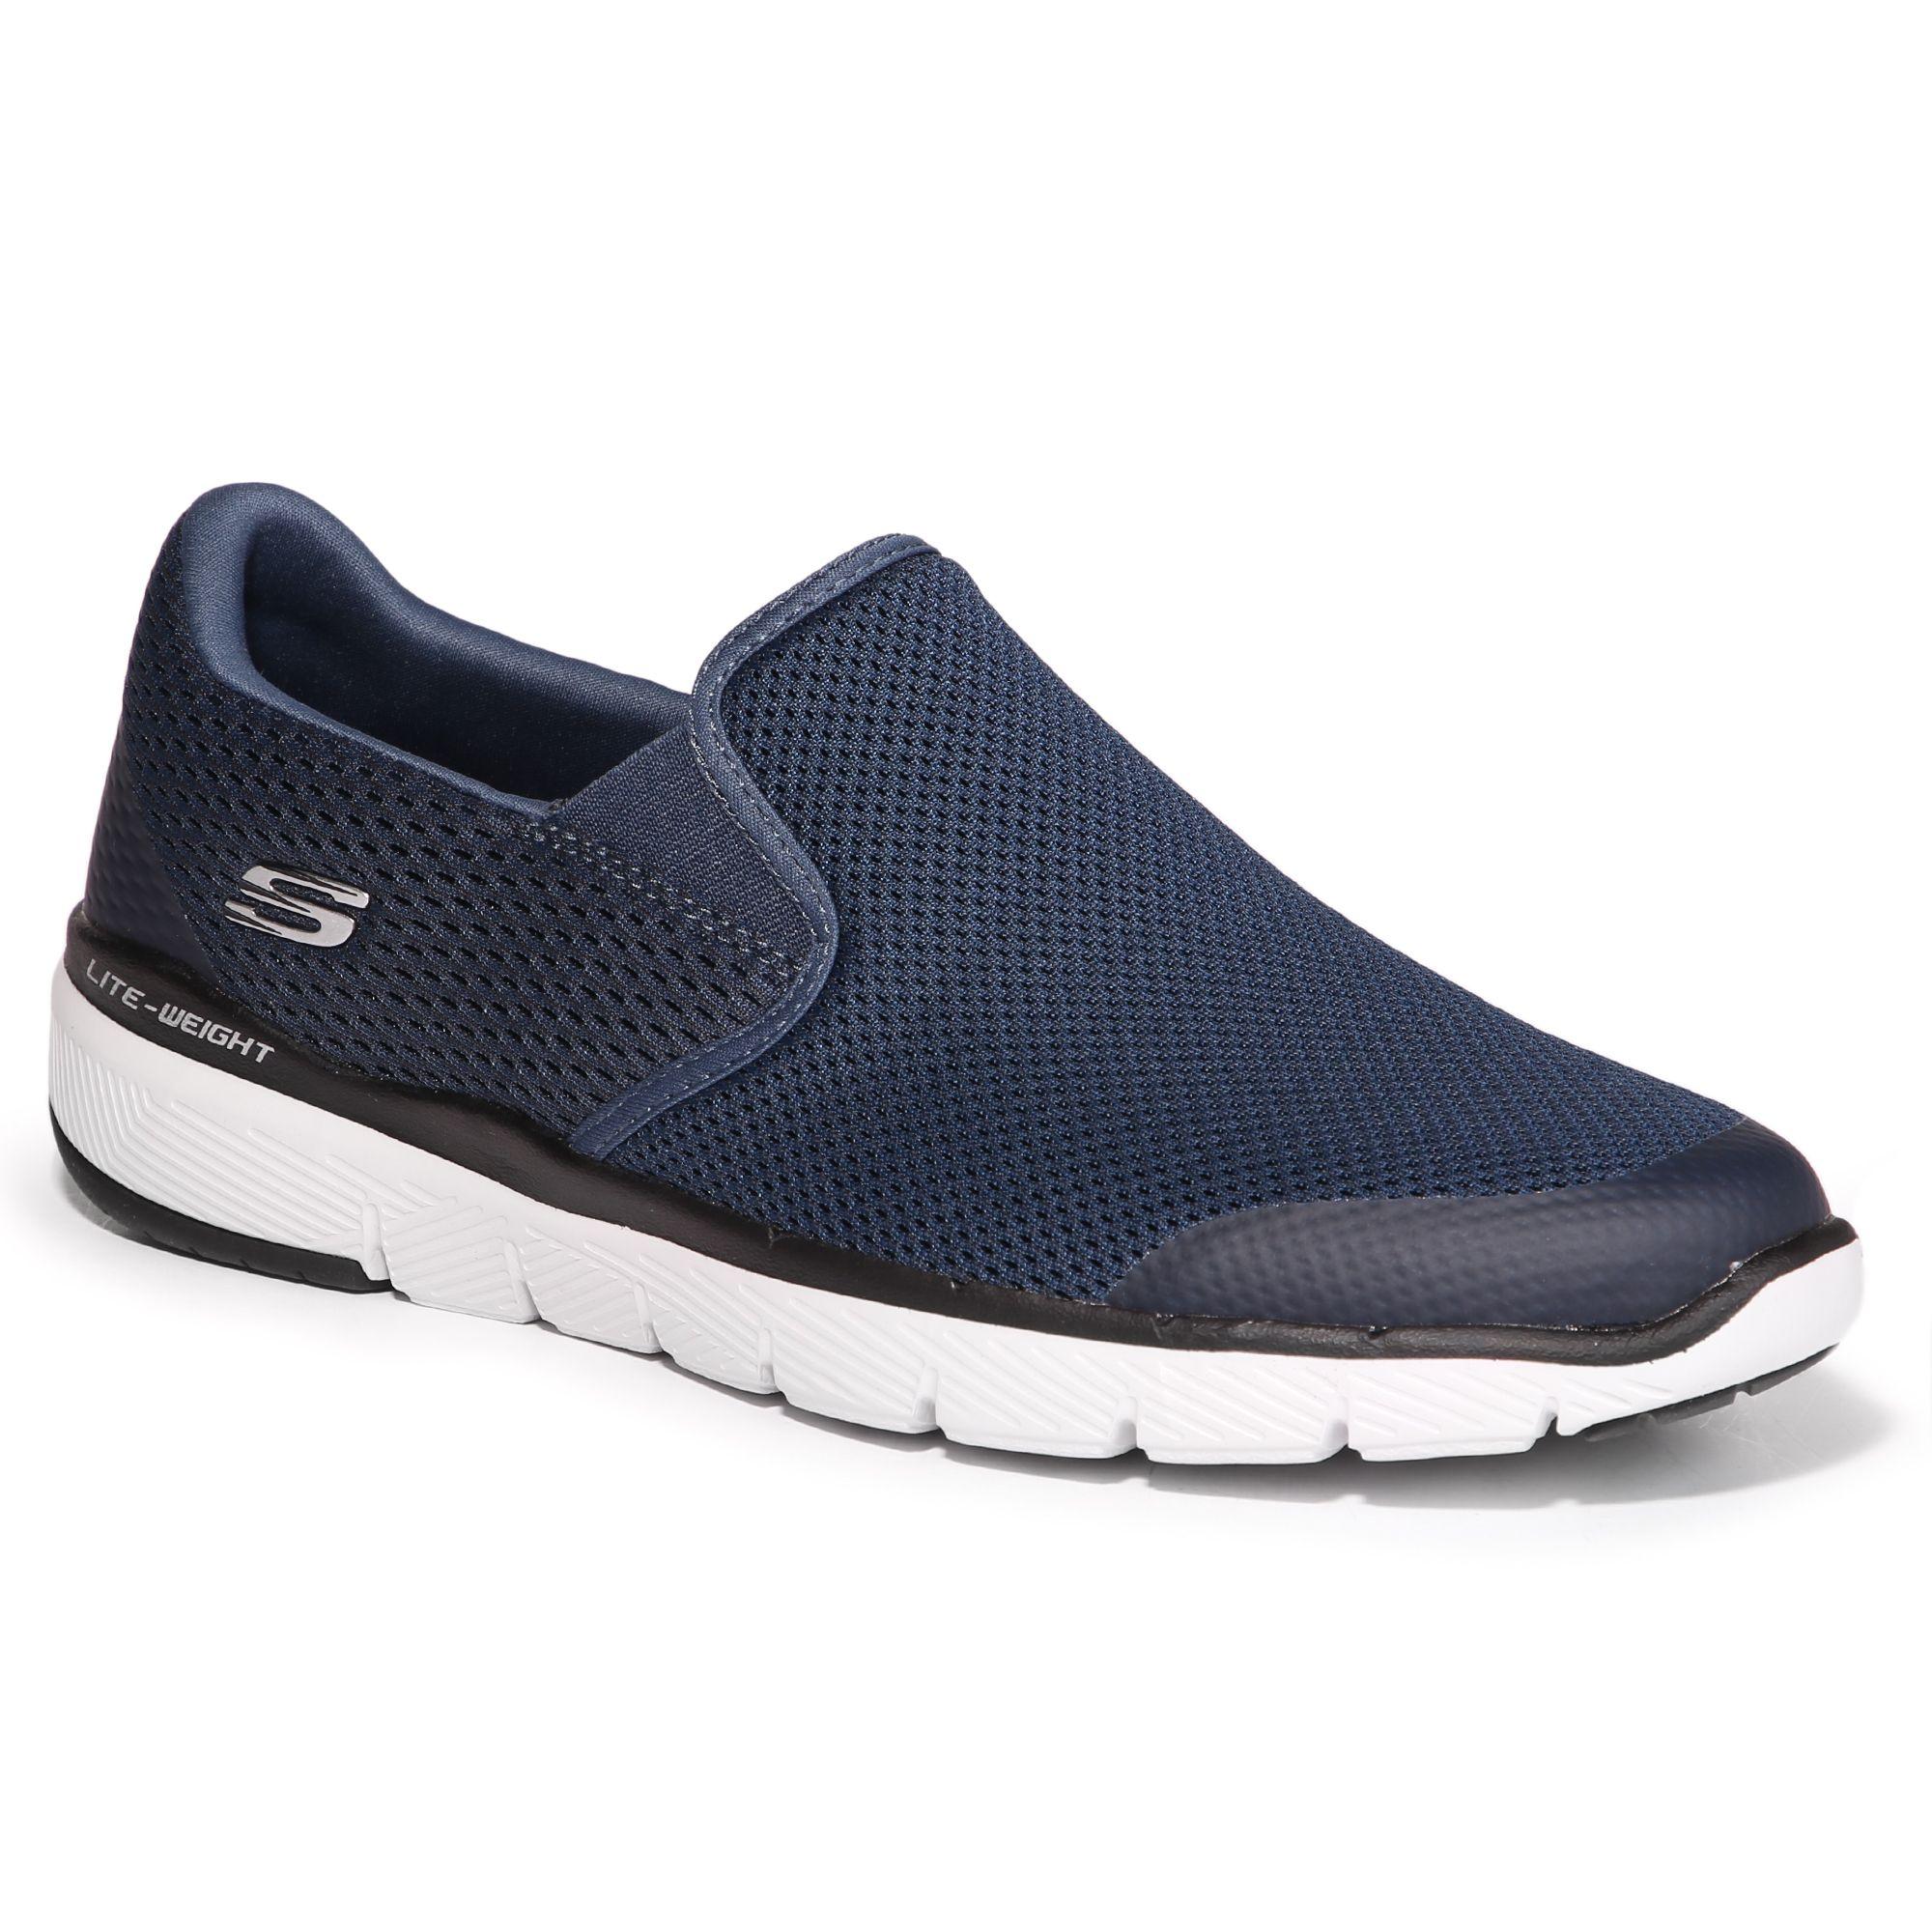 Qvc Sketcher Schuhe